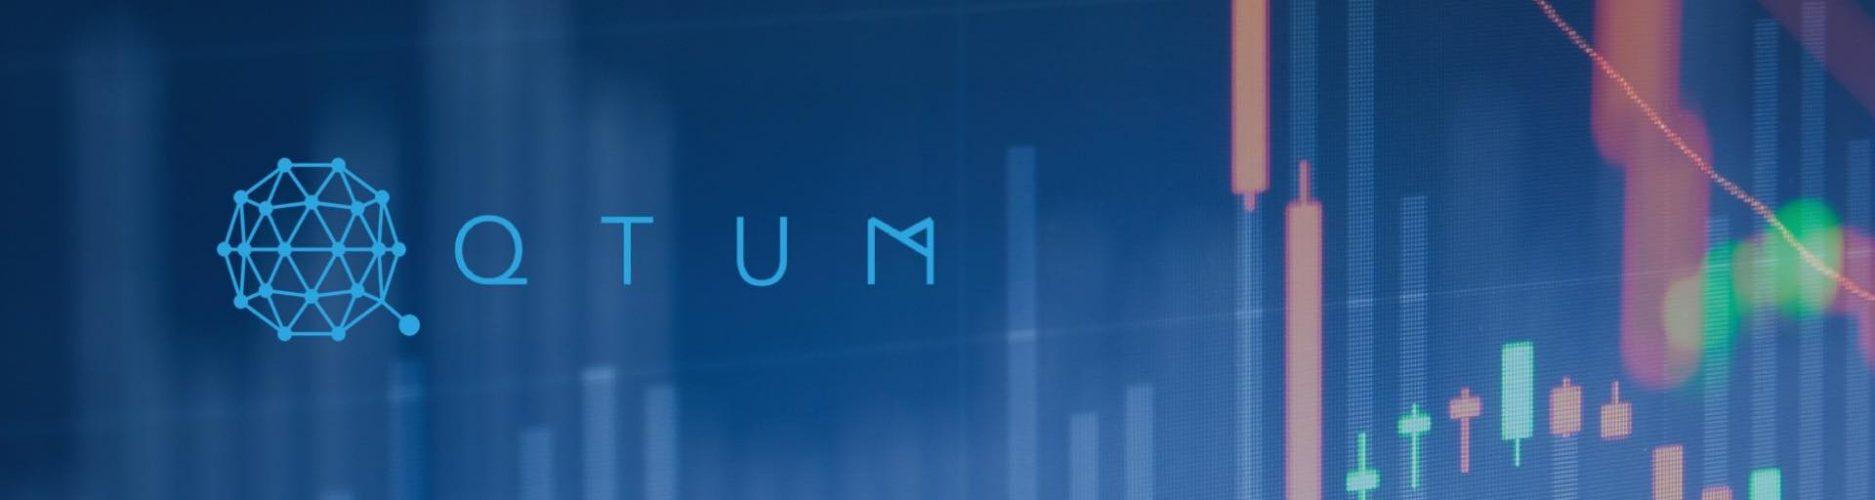 QTUM-trading-865784